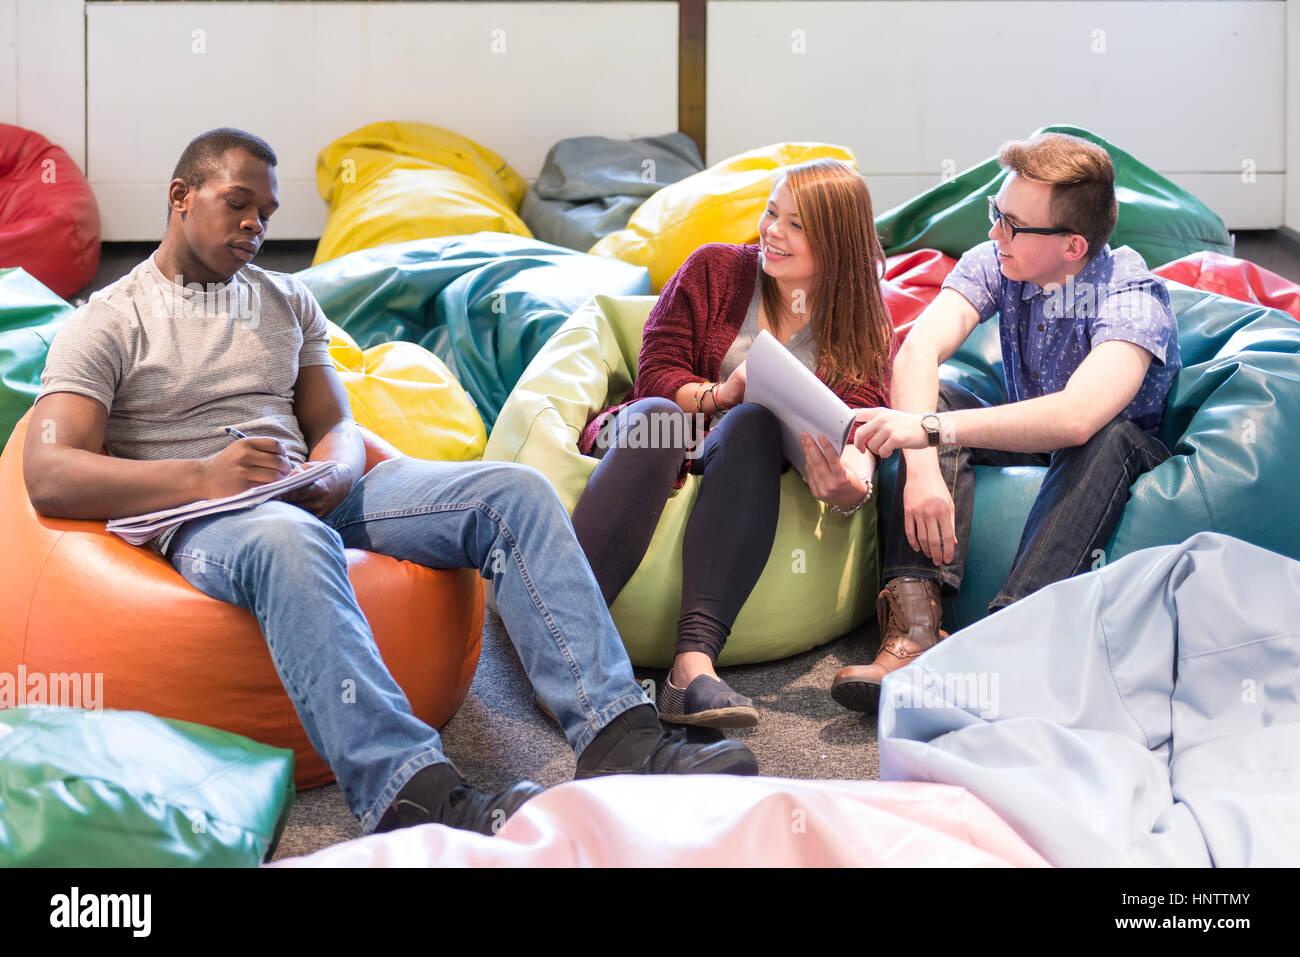 Studenten im universitären Umfeld, zusammenarbeiten. Stockbild